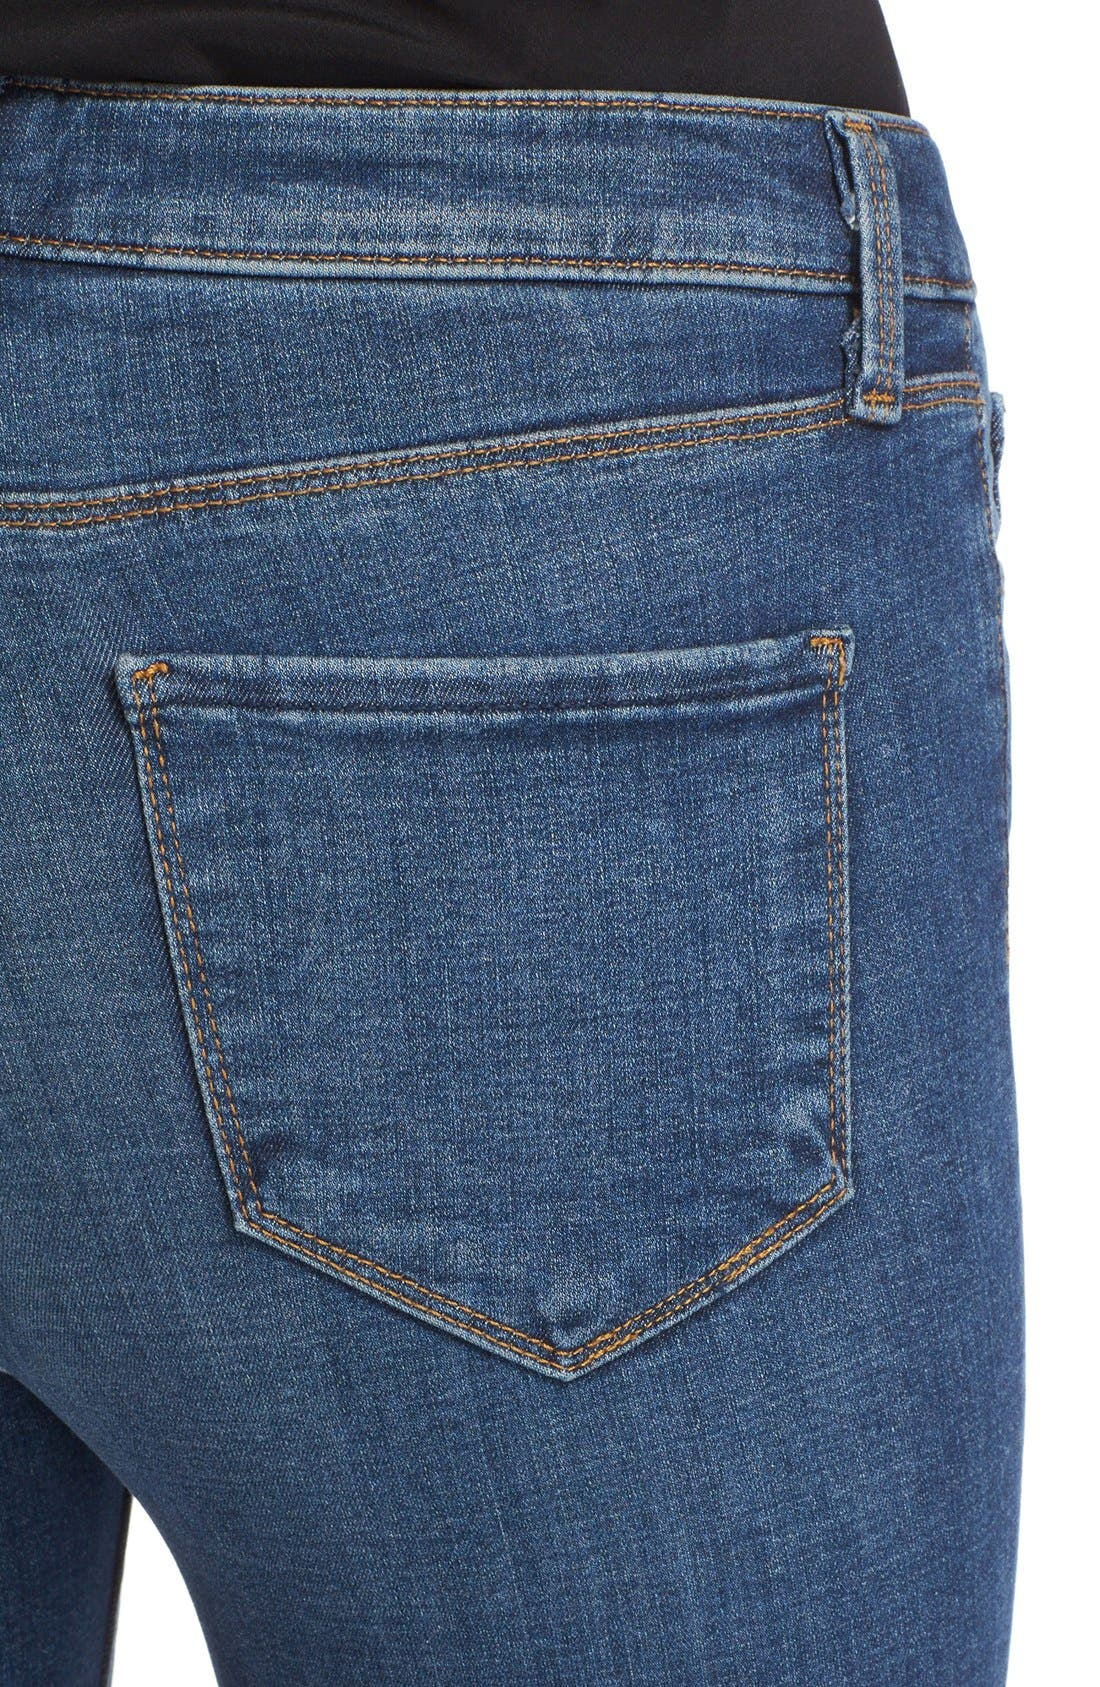 '30' High Rise Skinny Jeans,                             Alternate thumbnail 4, color,                             Dark Vintage